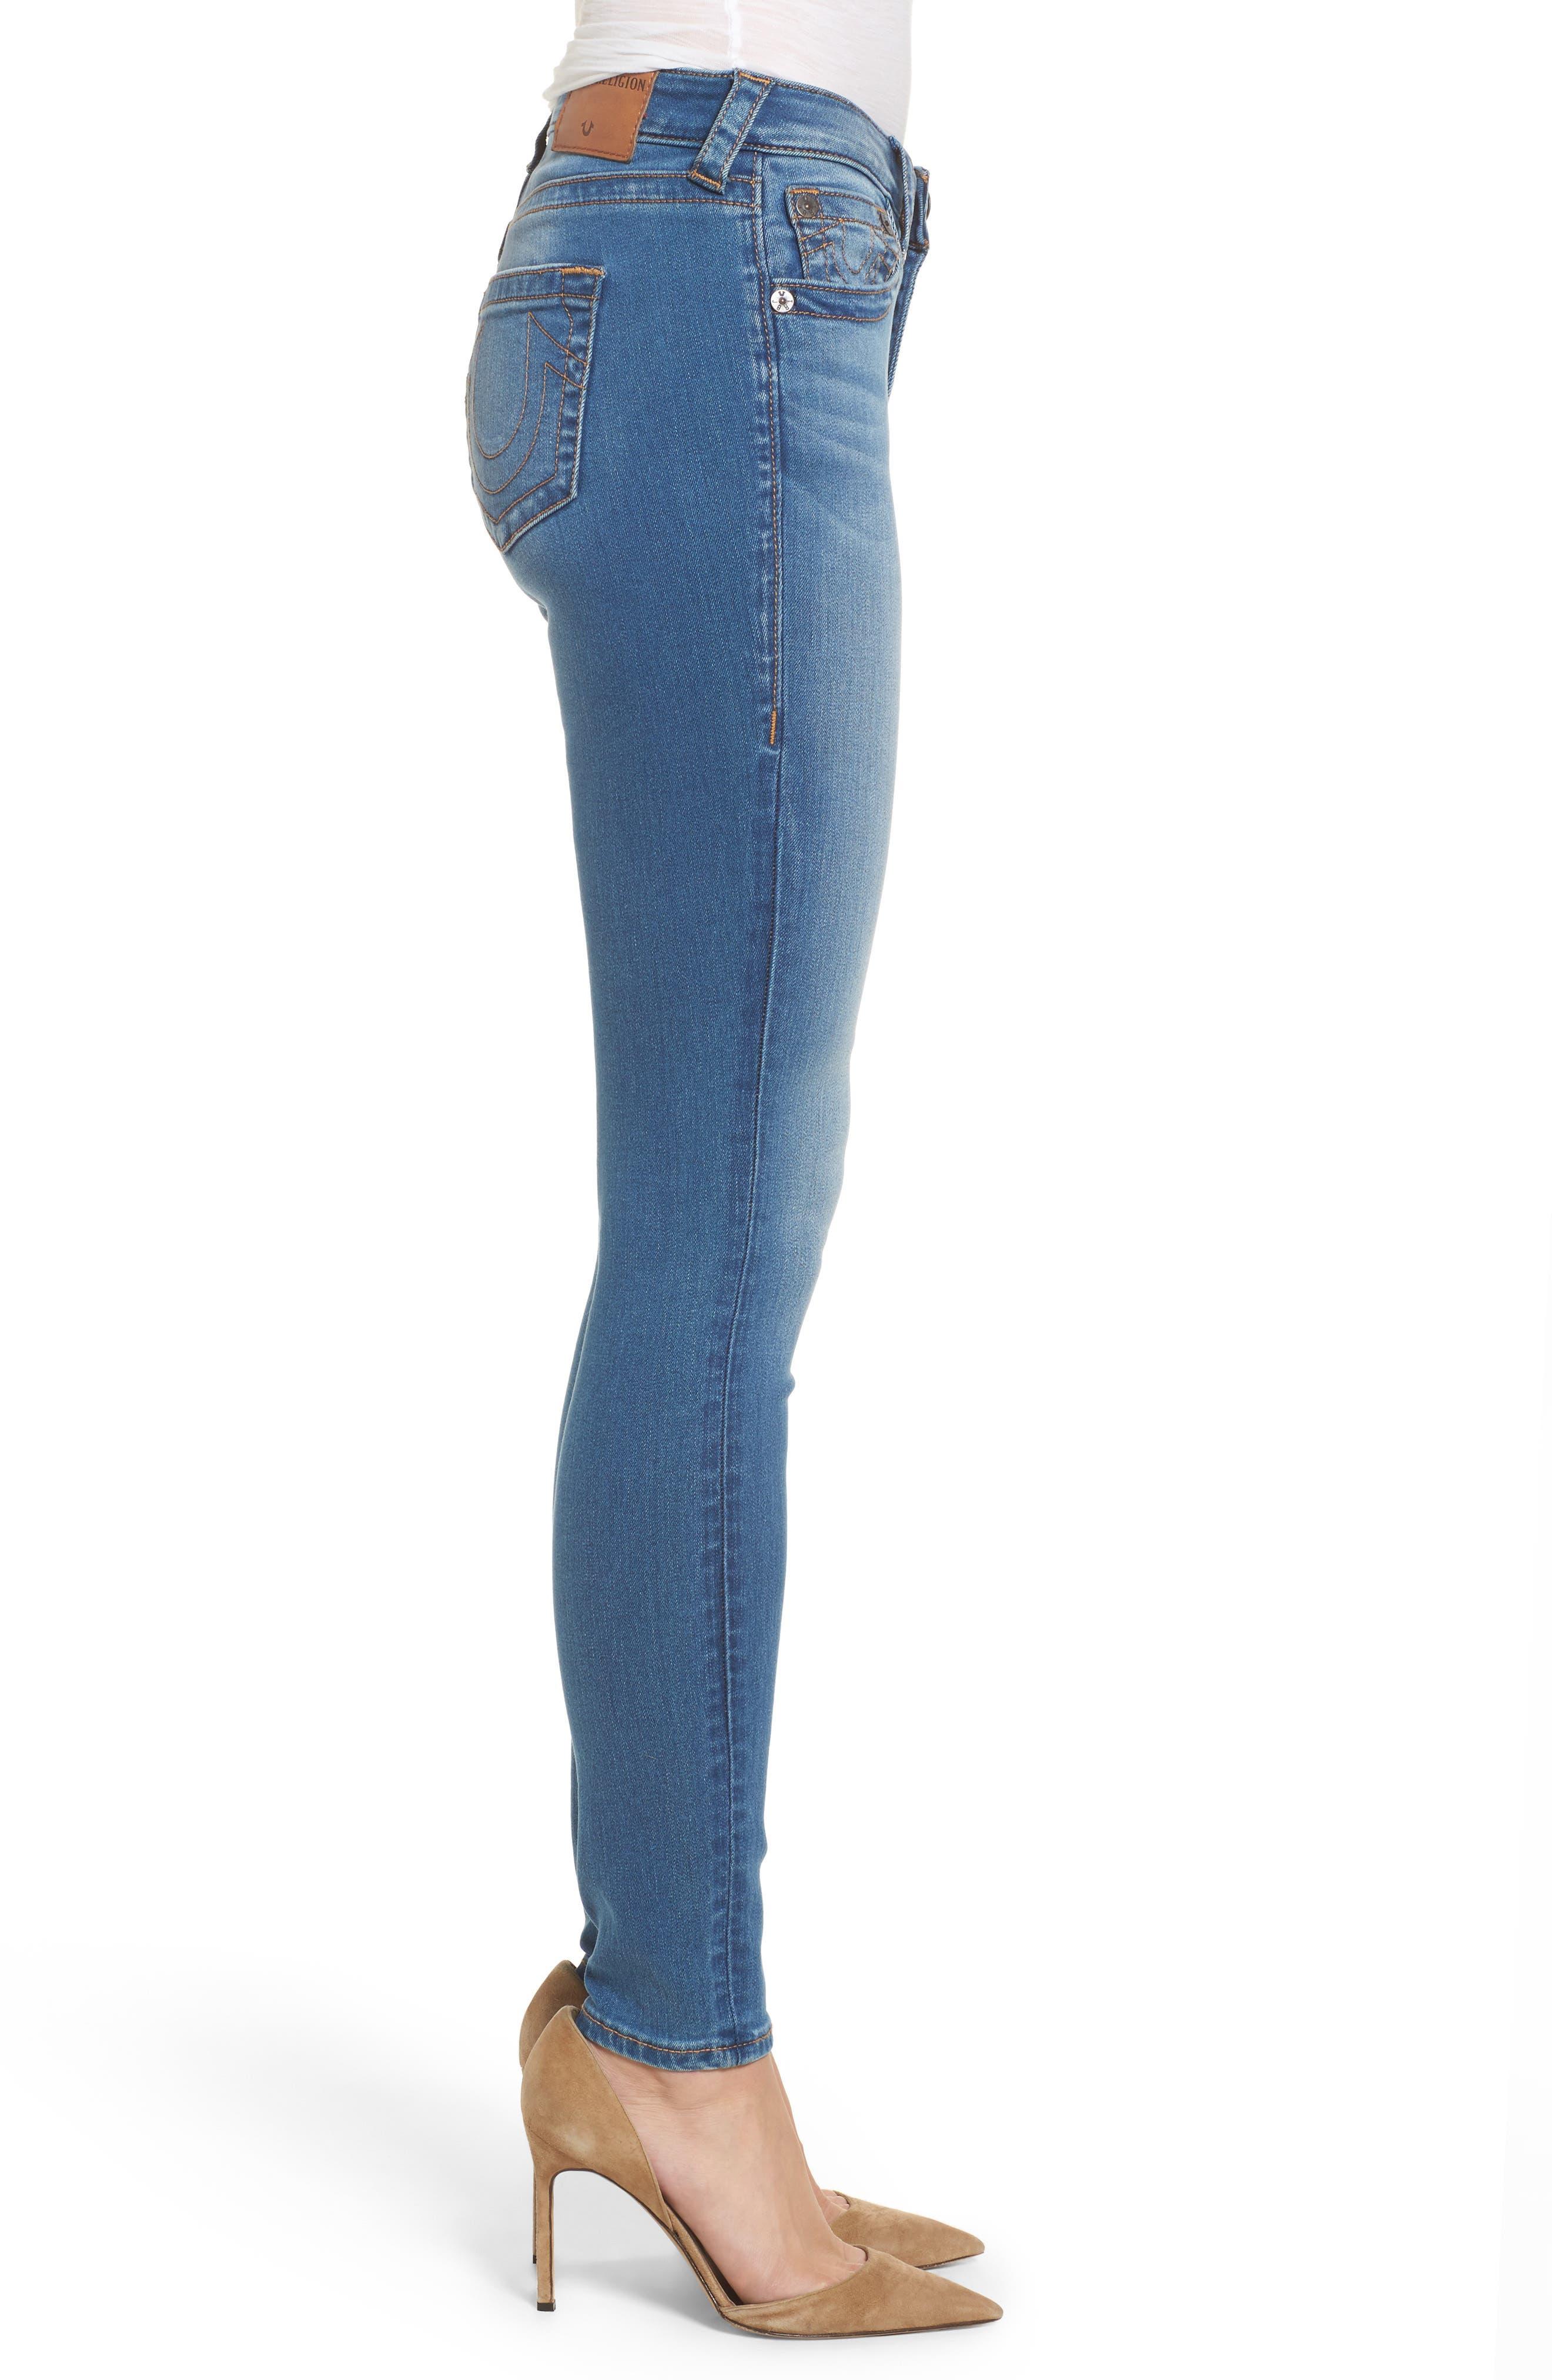 Jennie Curvy Skinny Jeans,                             Alternate thumbnail 3, color,                             Nu Authentic Indigo